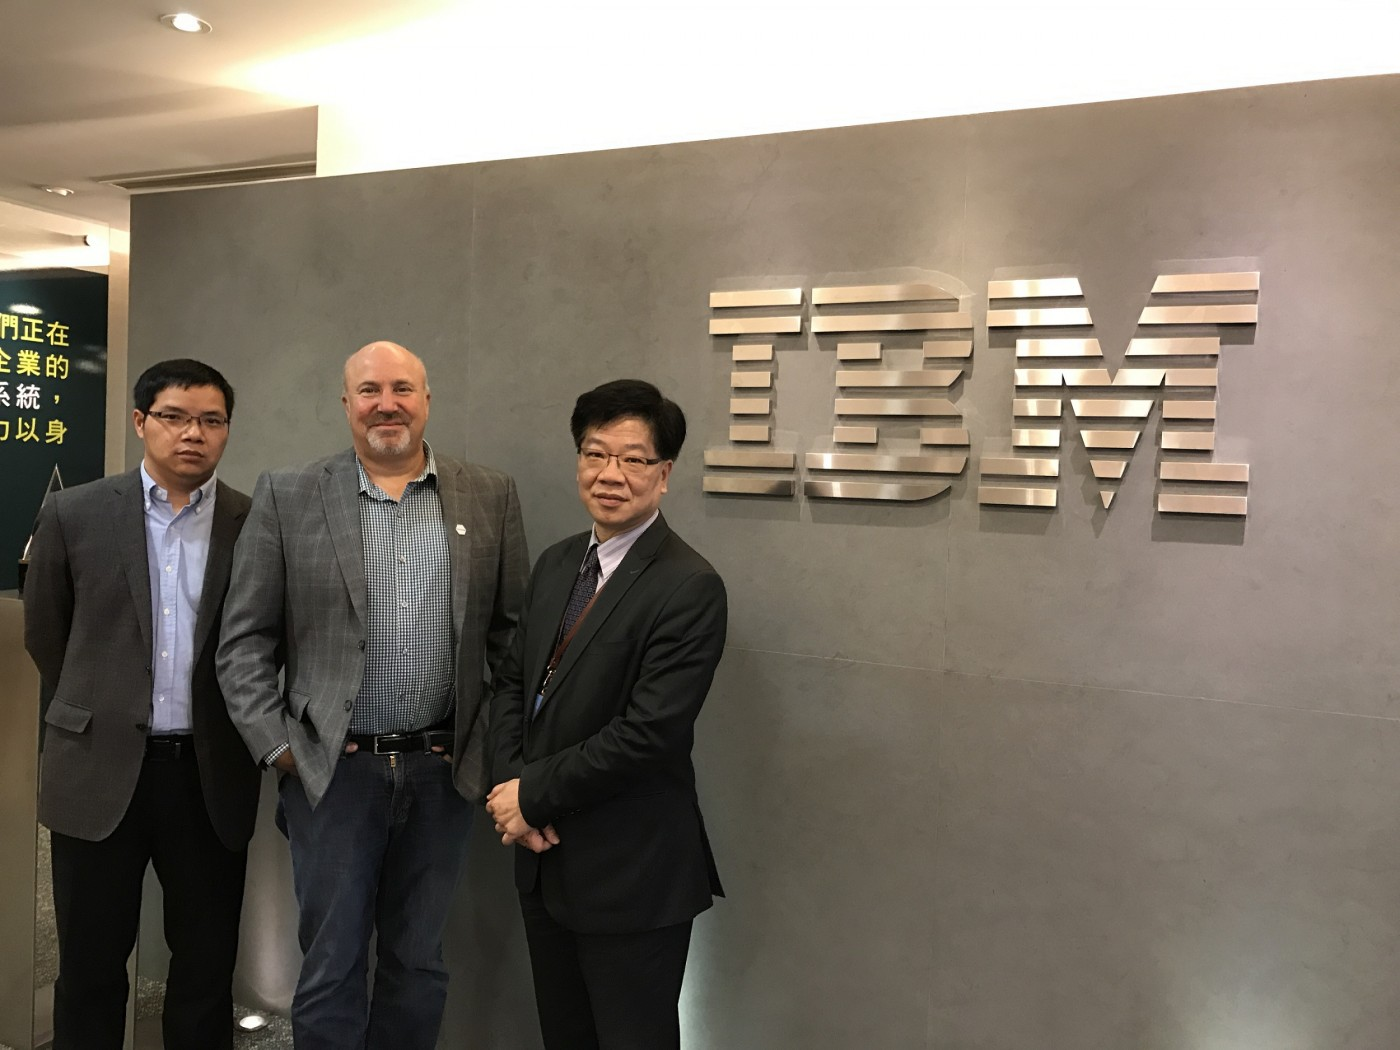 IBM力挺,全球最大區塊鏈聯盟Hyperledger會員突破122名